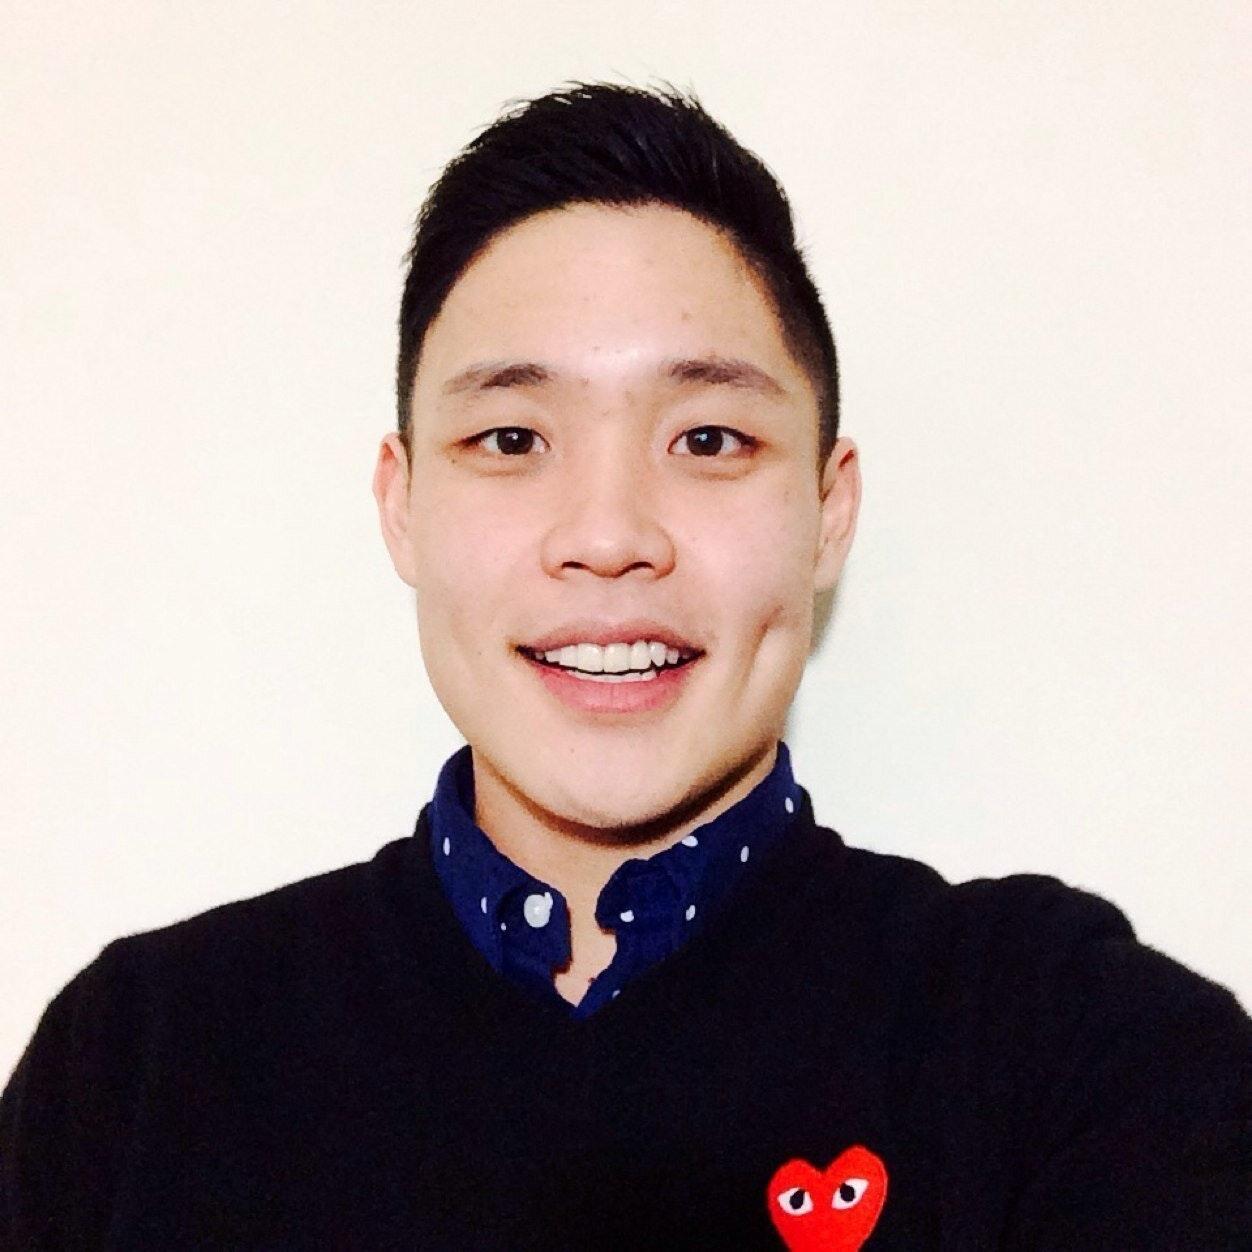 Jeff Park